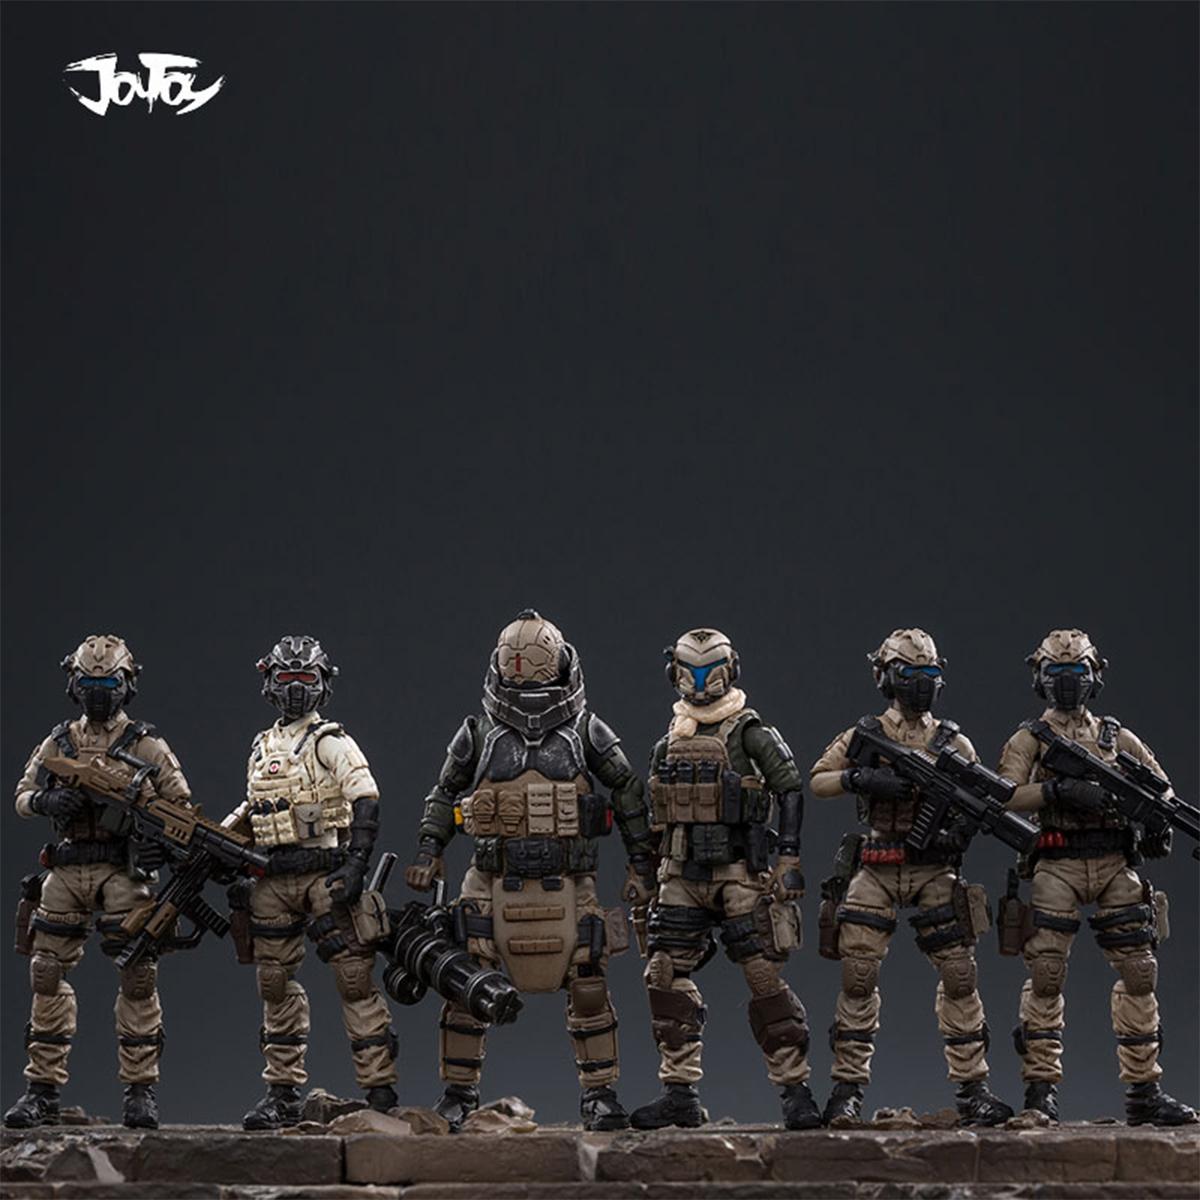 JOYTOY 51941011 1//25 Battlefield Field Command Center Scene Figure Toy